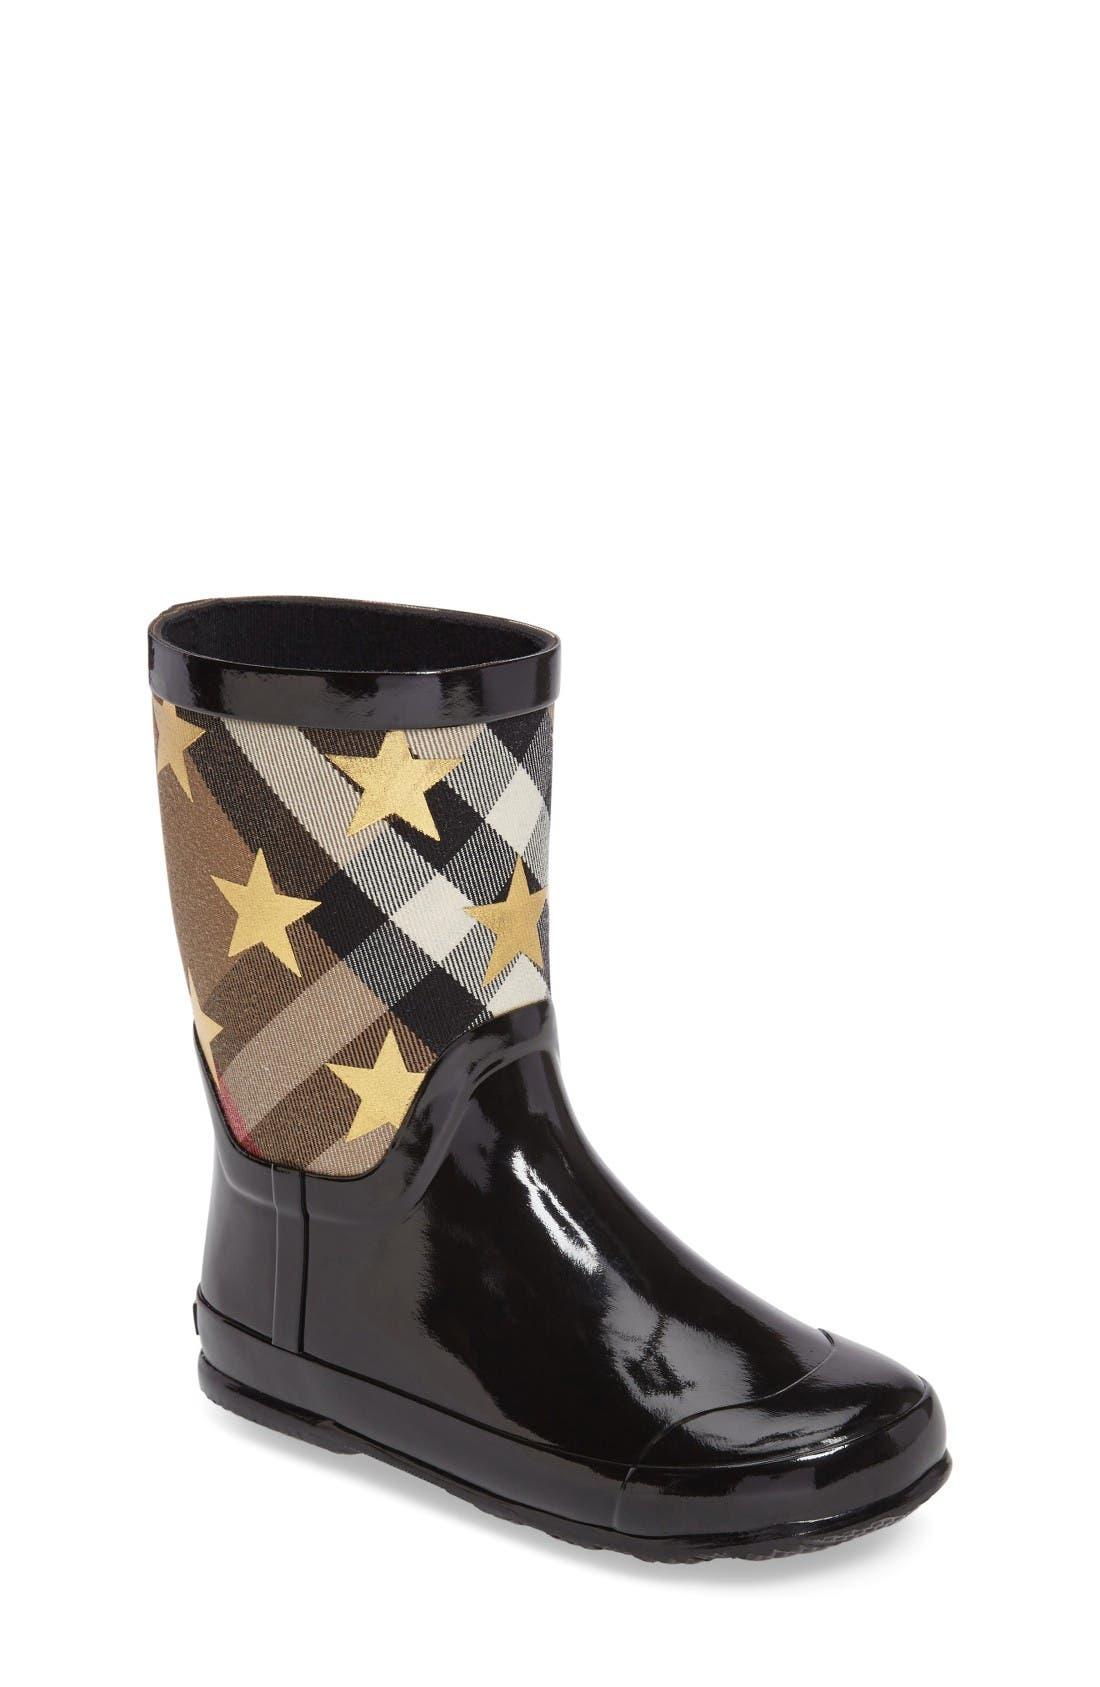 Main Image - Burberry Ranmoor Star Rain Boot (Toddler & Little Kid)